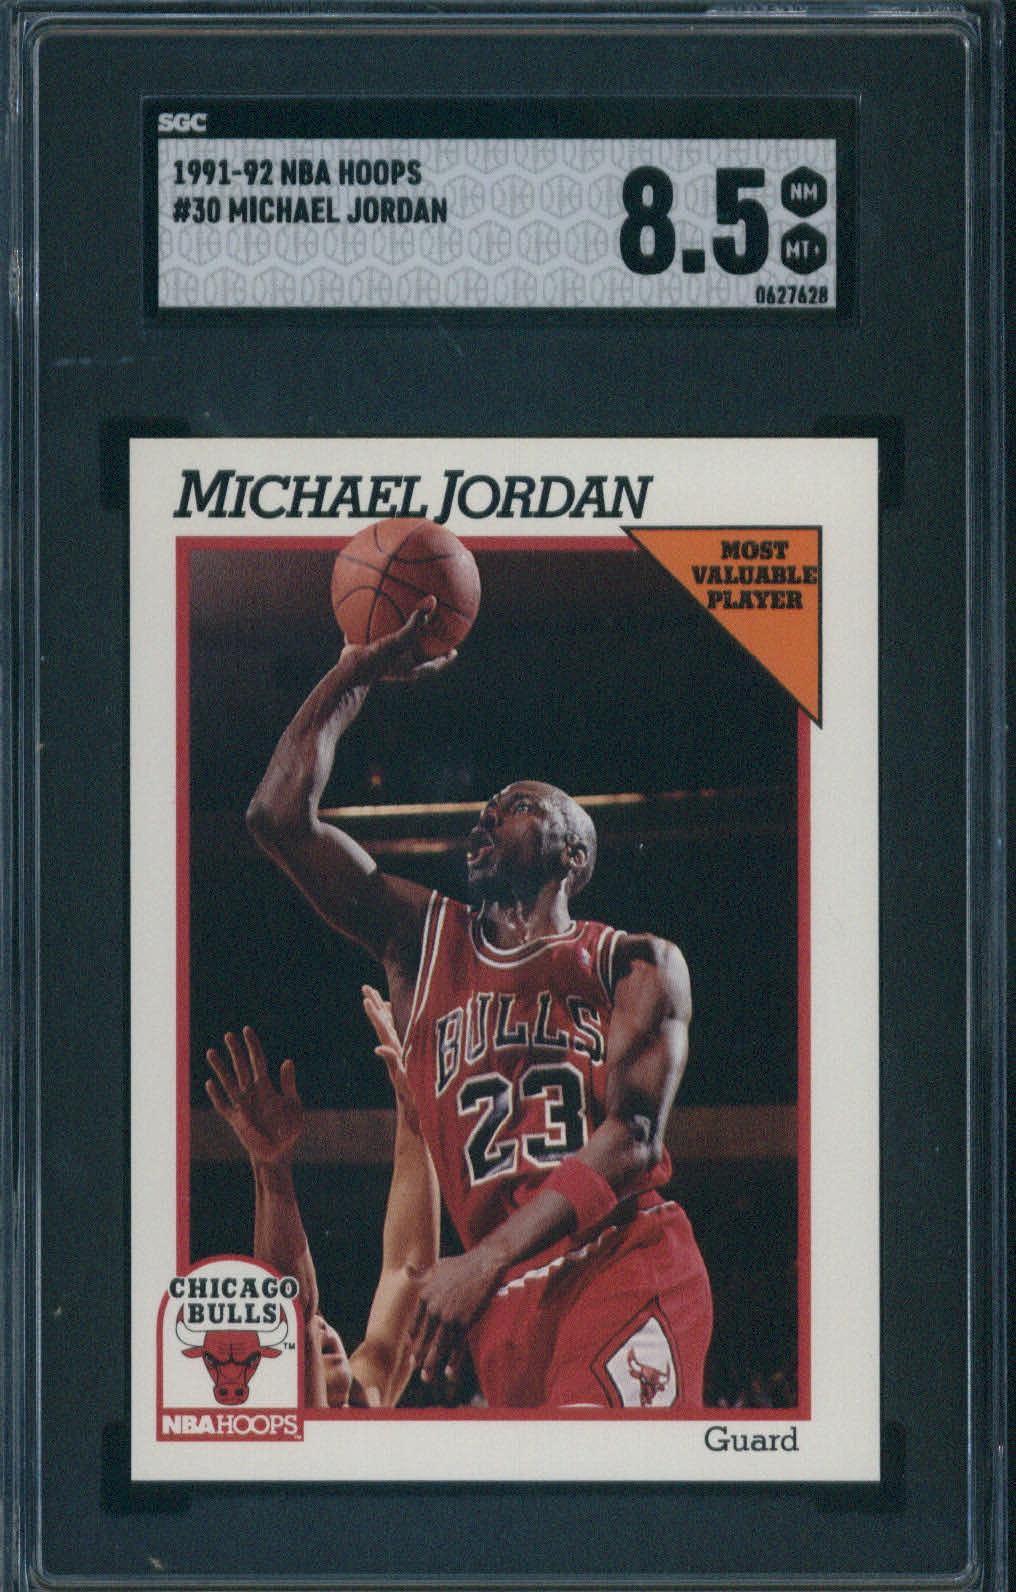 1991 NBA Hoops #30 Michael Jordan SGC 8.5